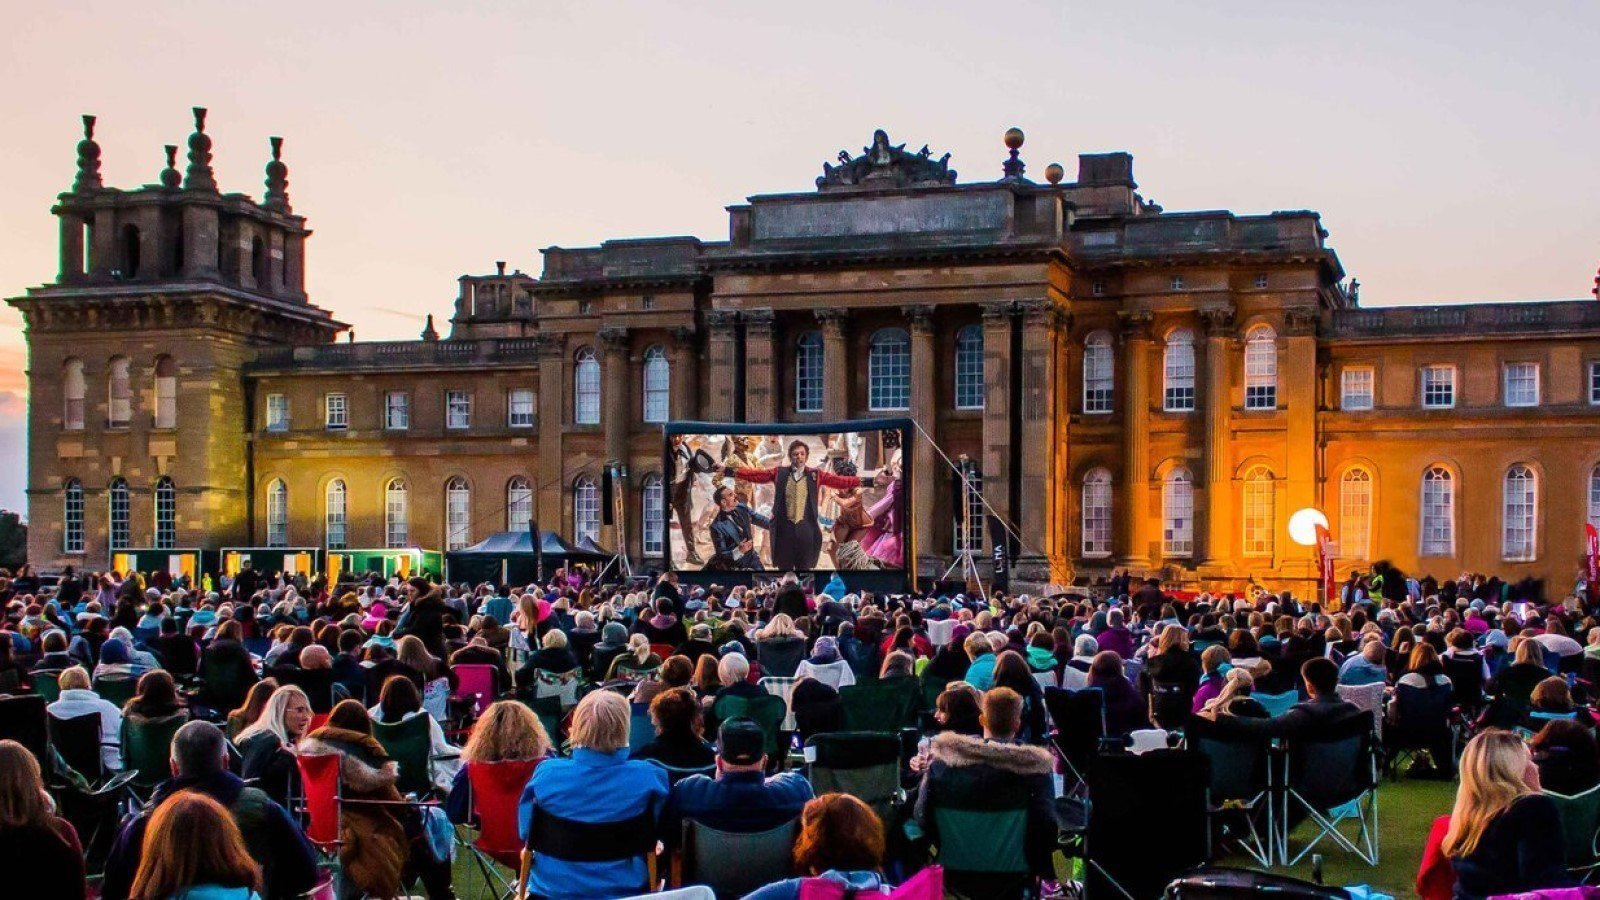 The Luna Open-Air Cinema at Blenheim Palace